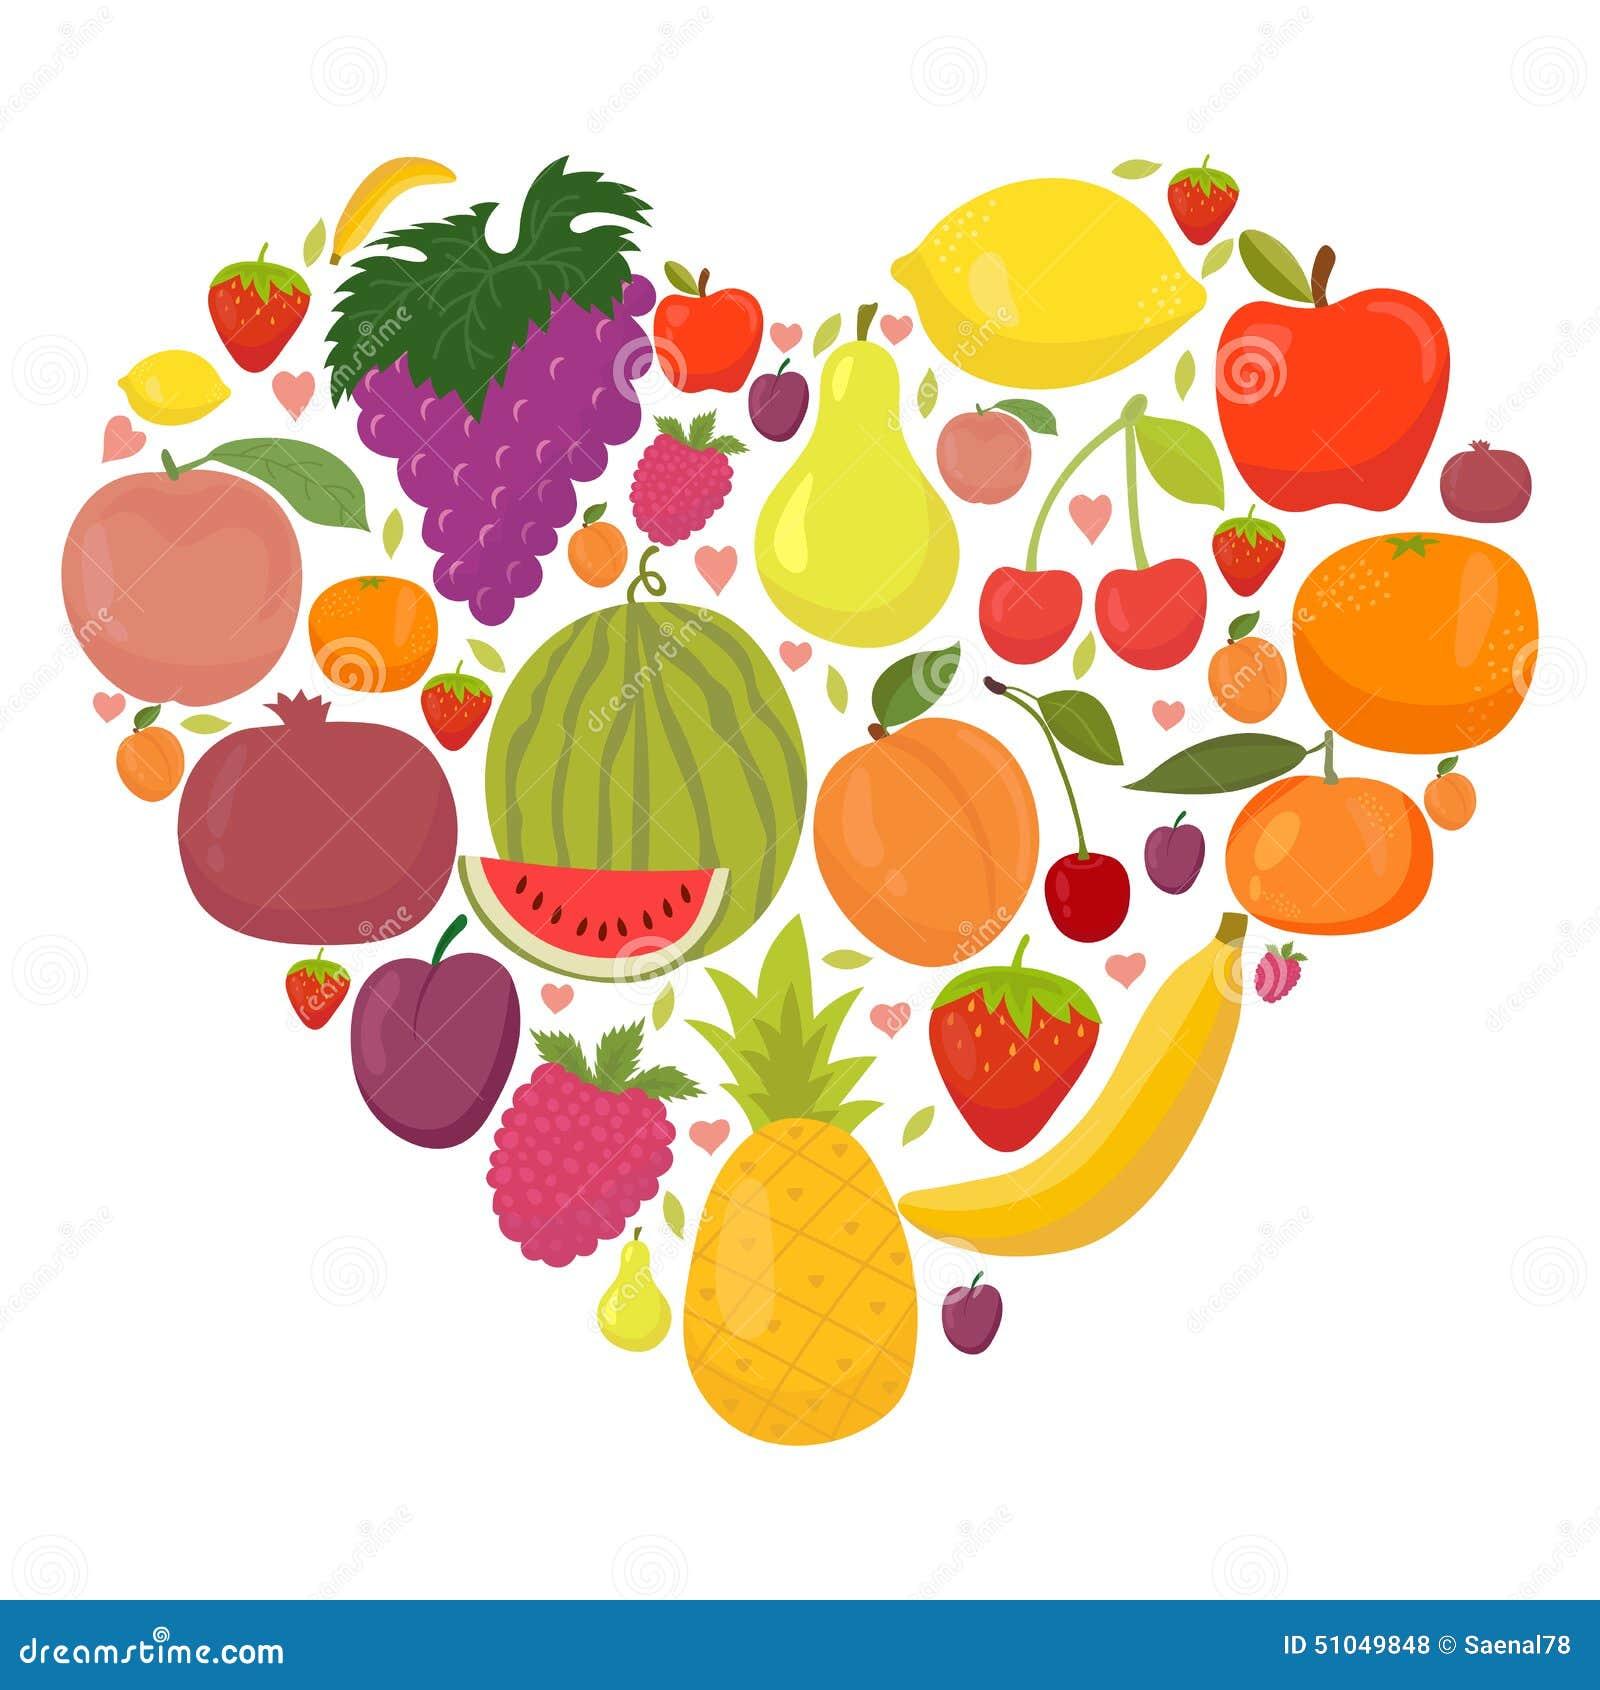 heart fruit healthy fruits